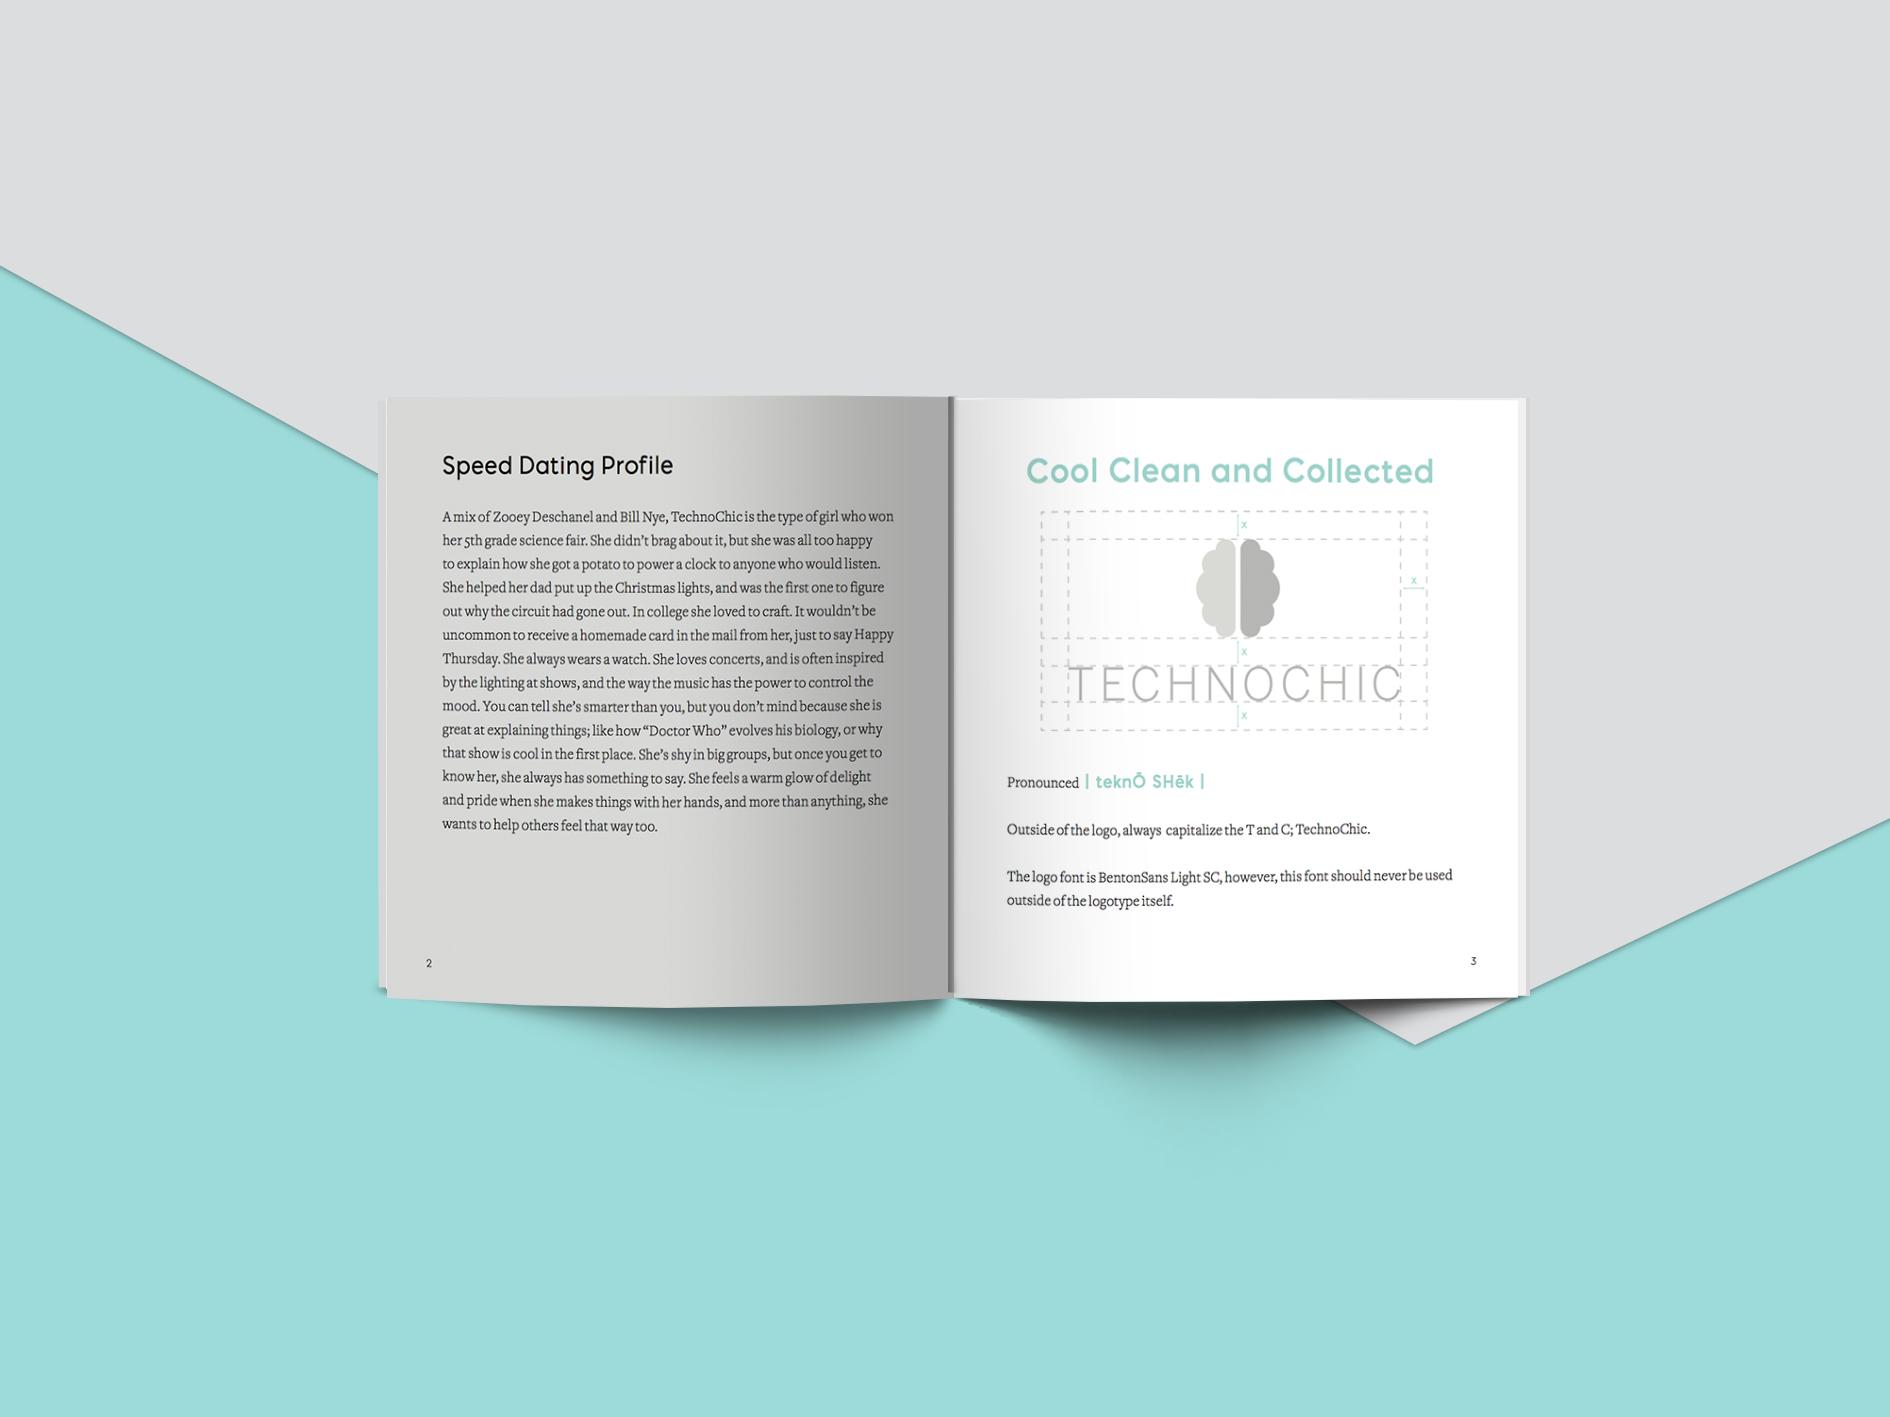 technochic_spread_1.jpg